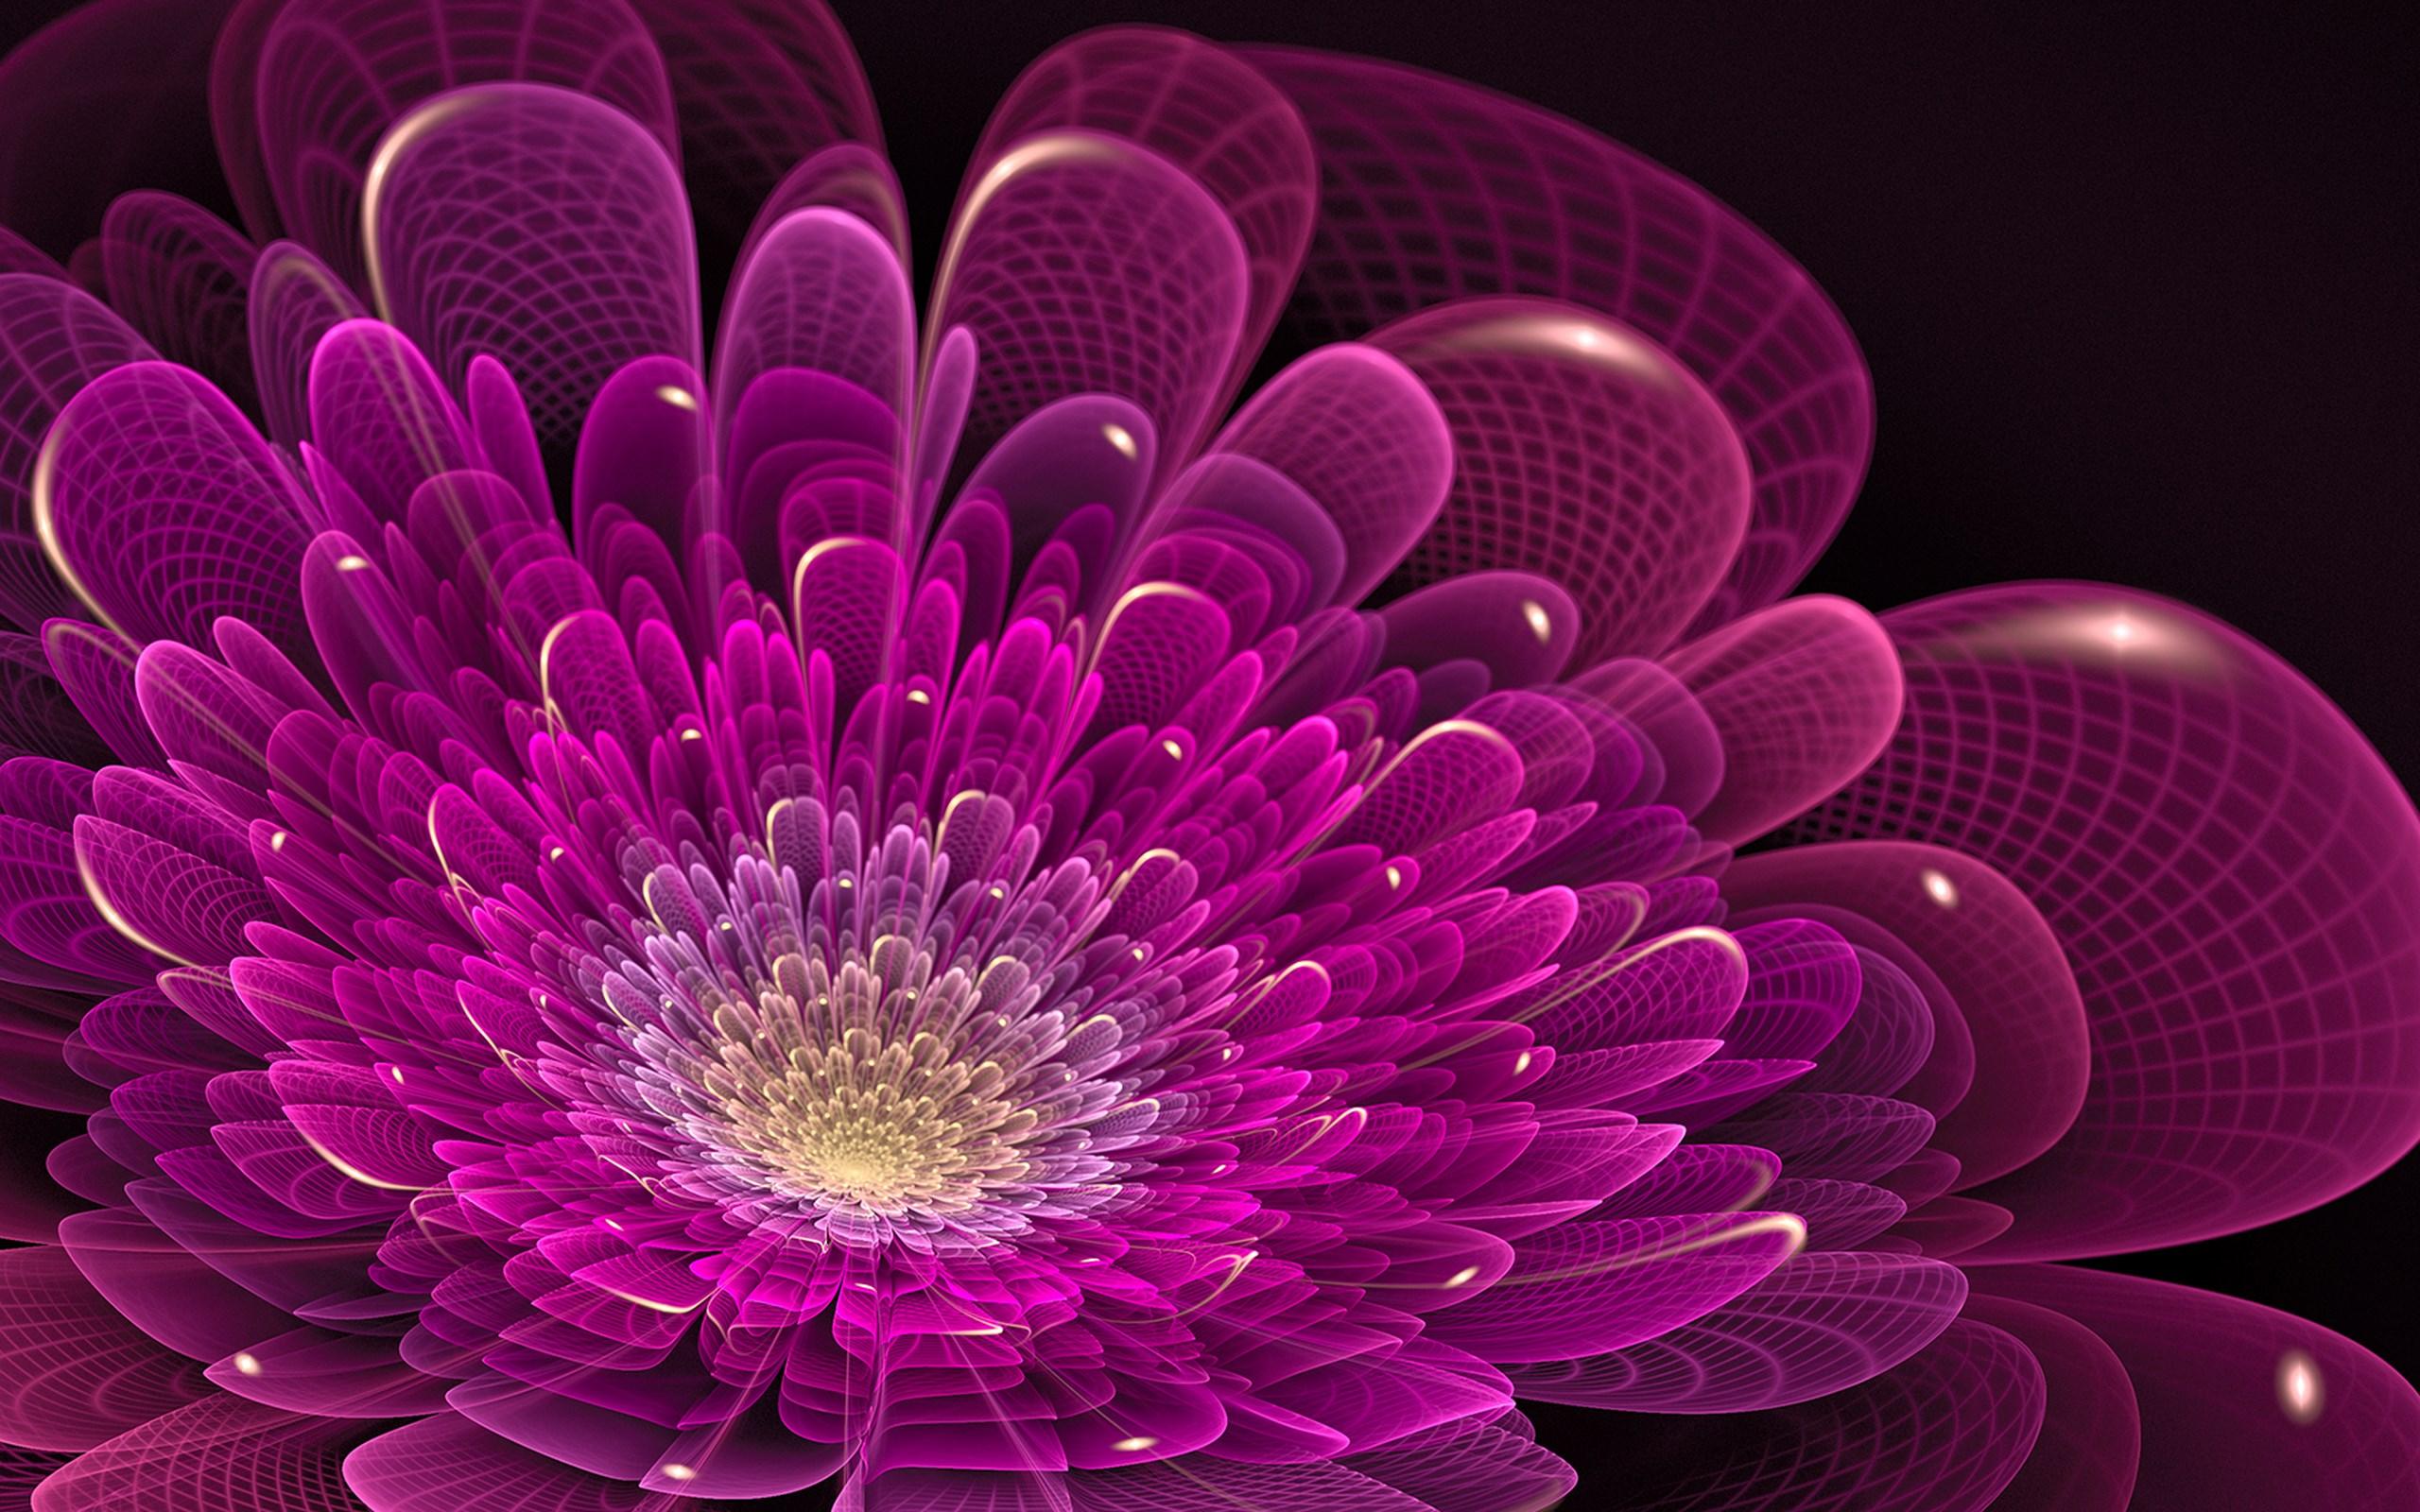 3840x1080 Wallpaper Purple